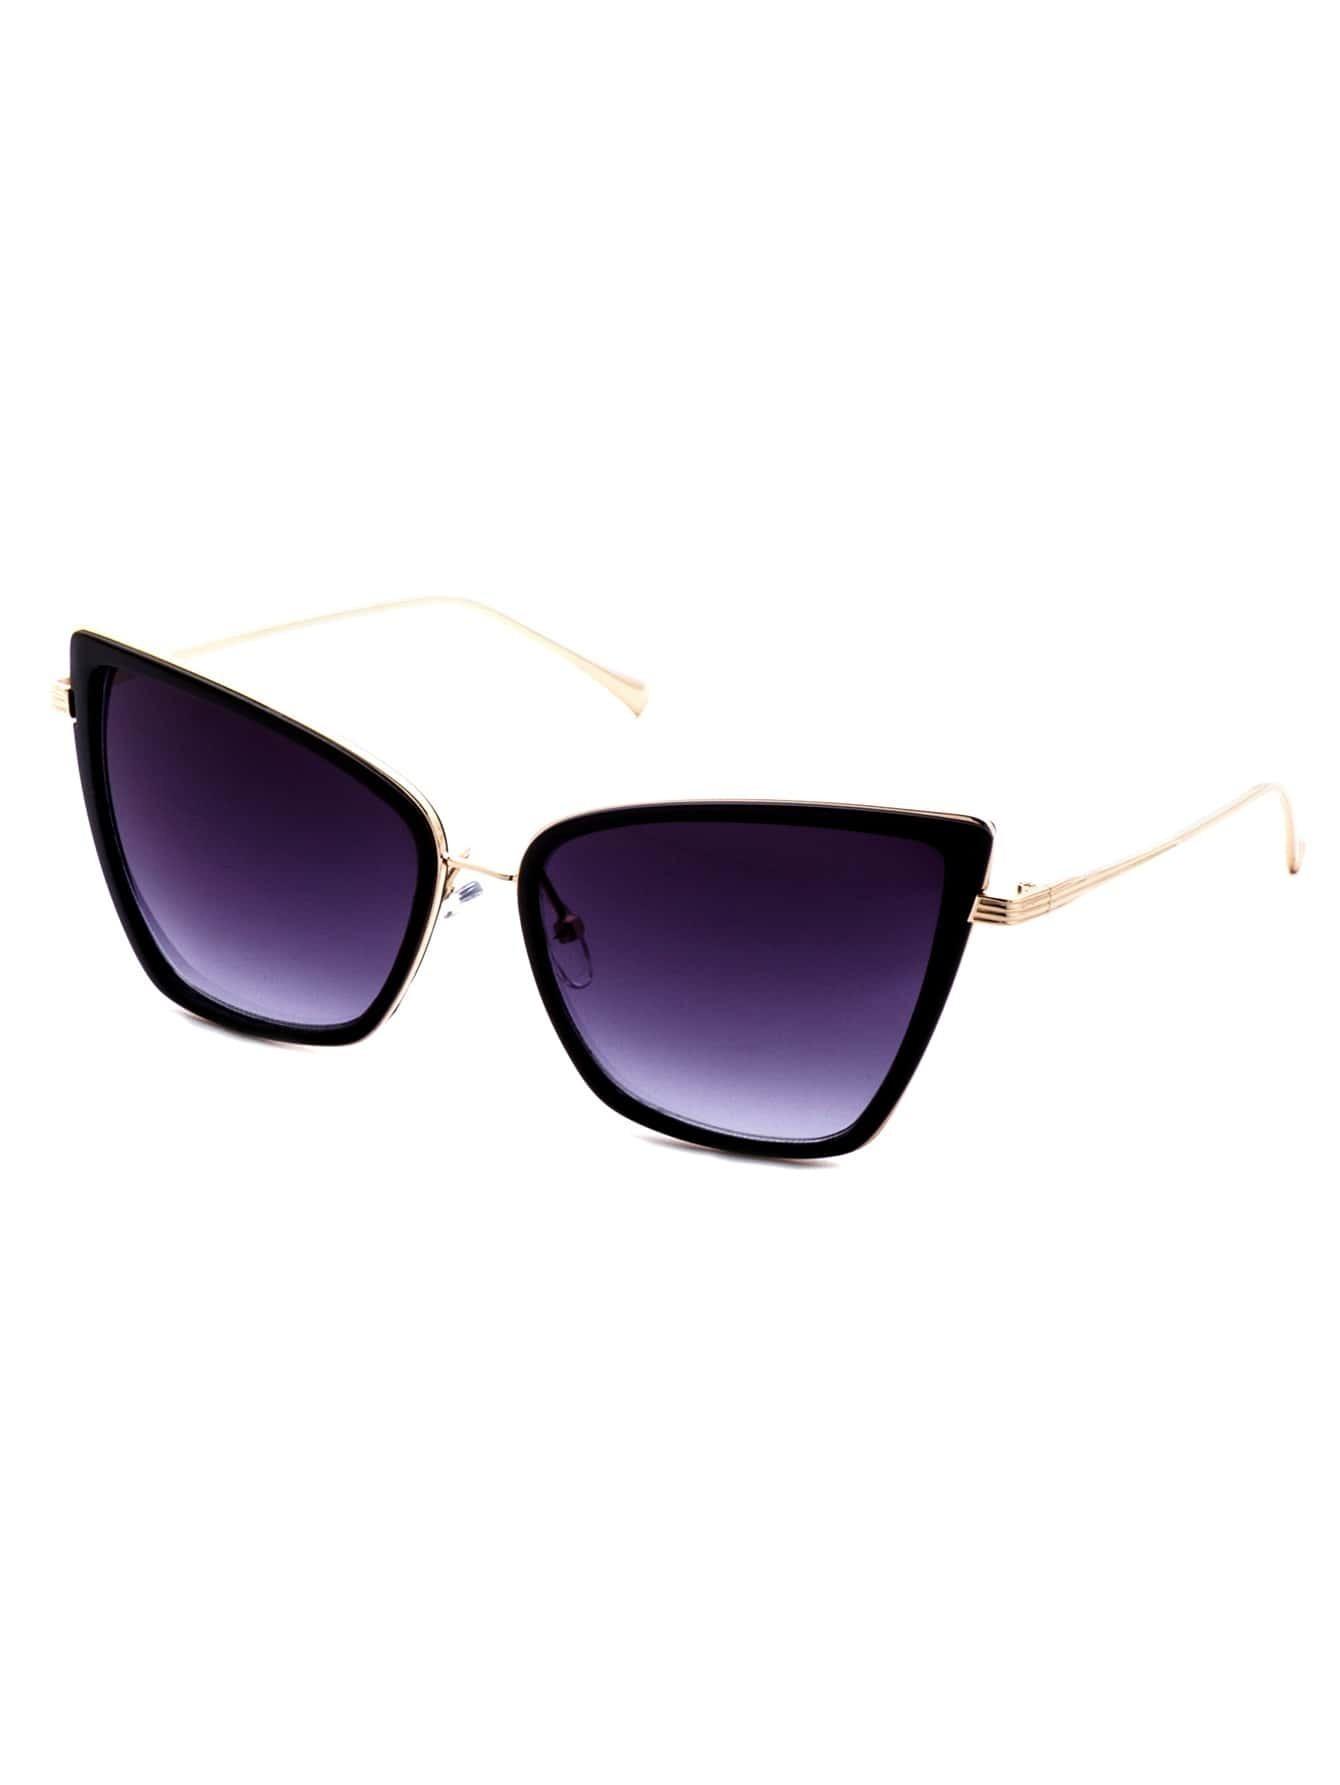 Black And Gold Frame Cat Eye Sunglasses